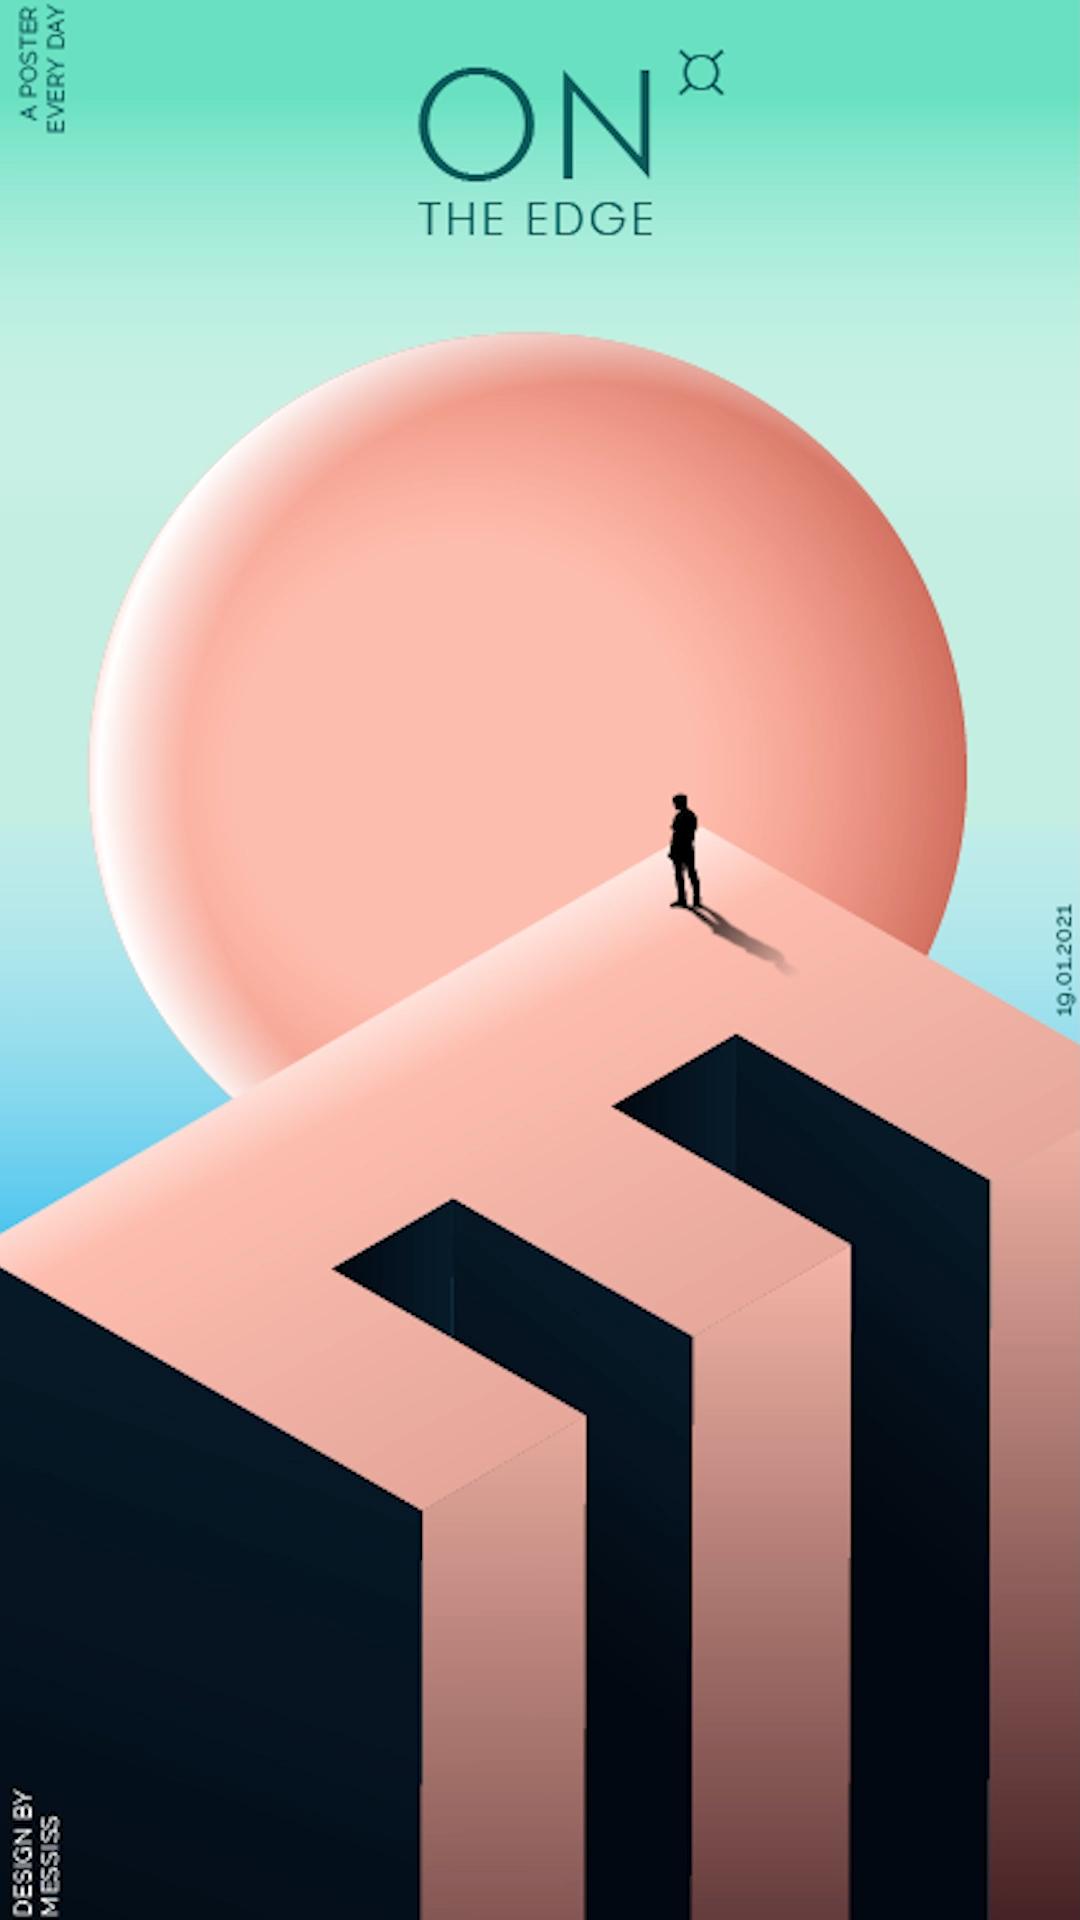 Adobe Illustrator Tuturial | Colorful Poster